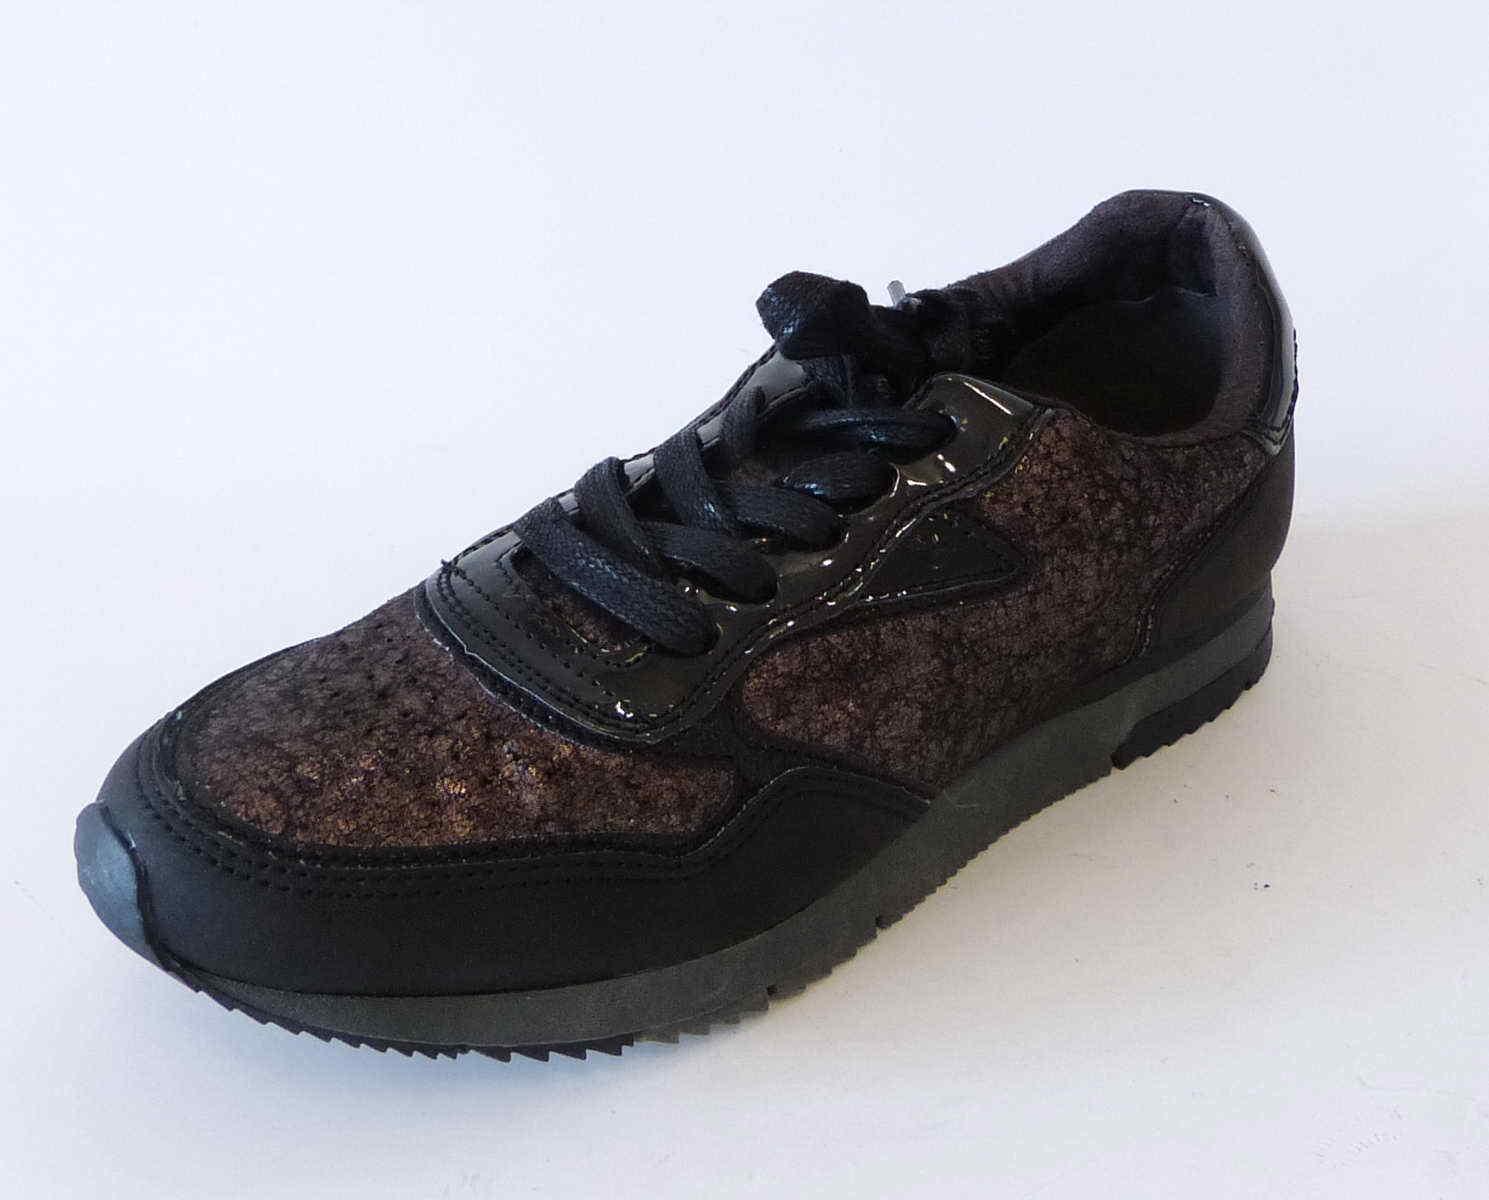 499befae96f06 Tamaris Sneaker 098 black Halbschuh brown gold Schnür 23601 ocytwd2380- Women s Trainers